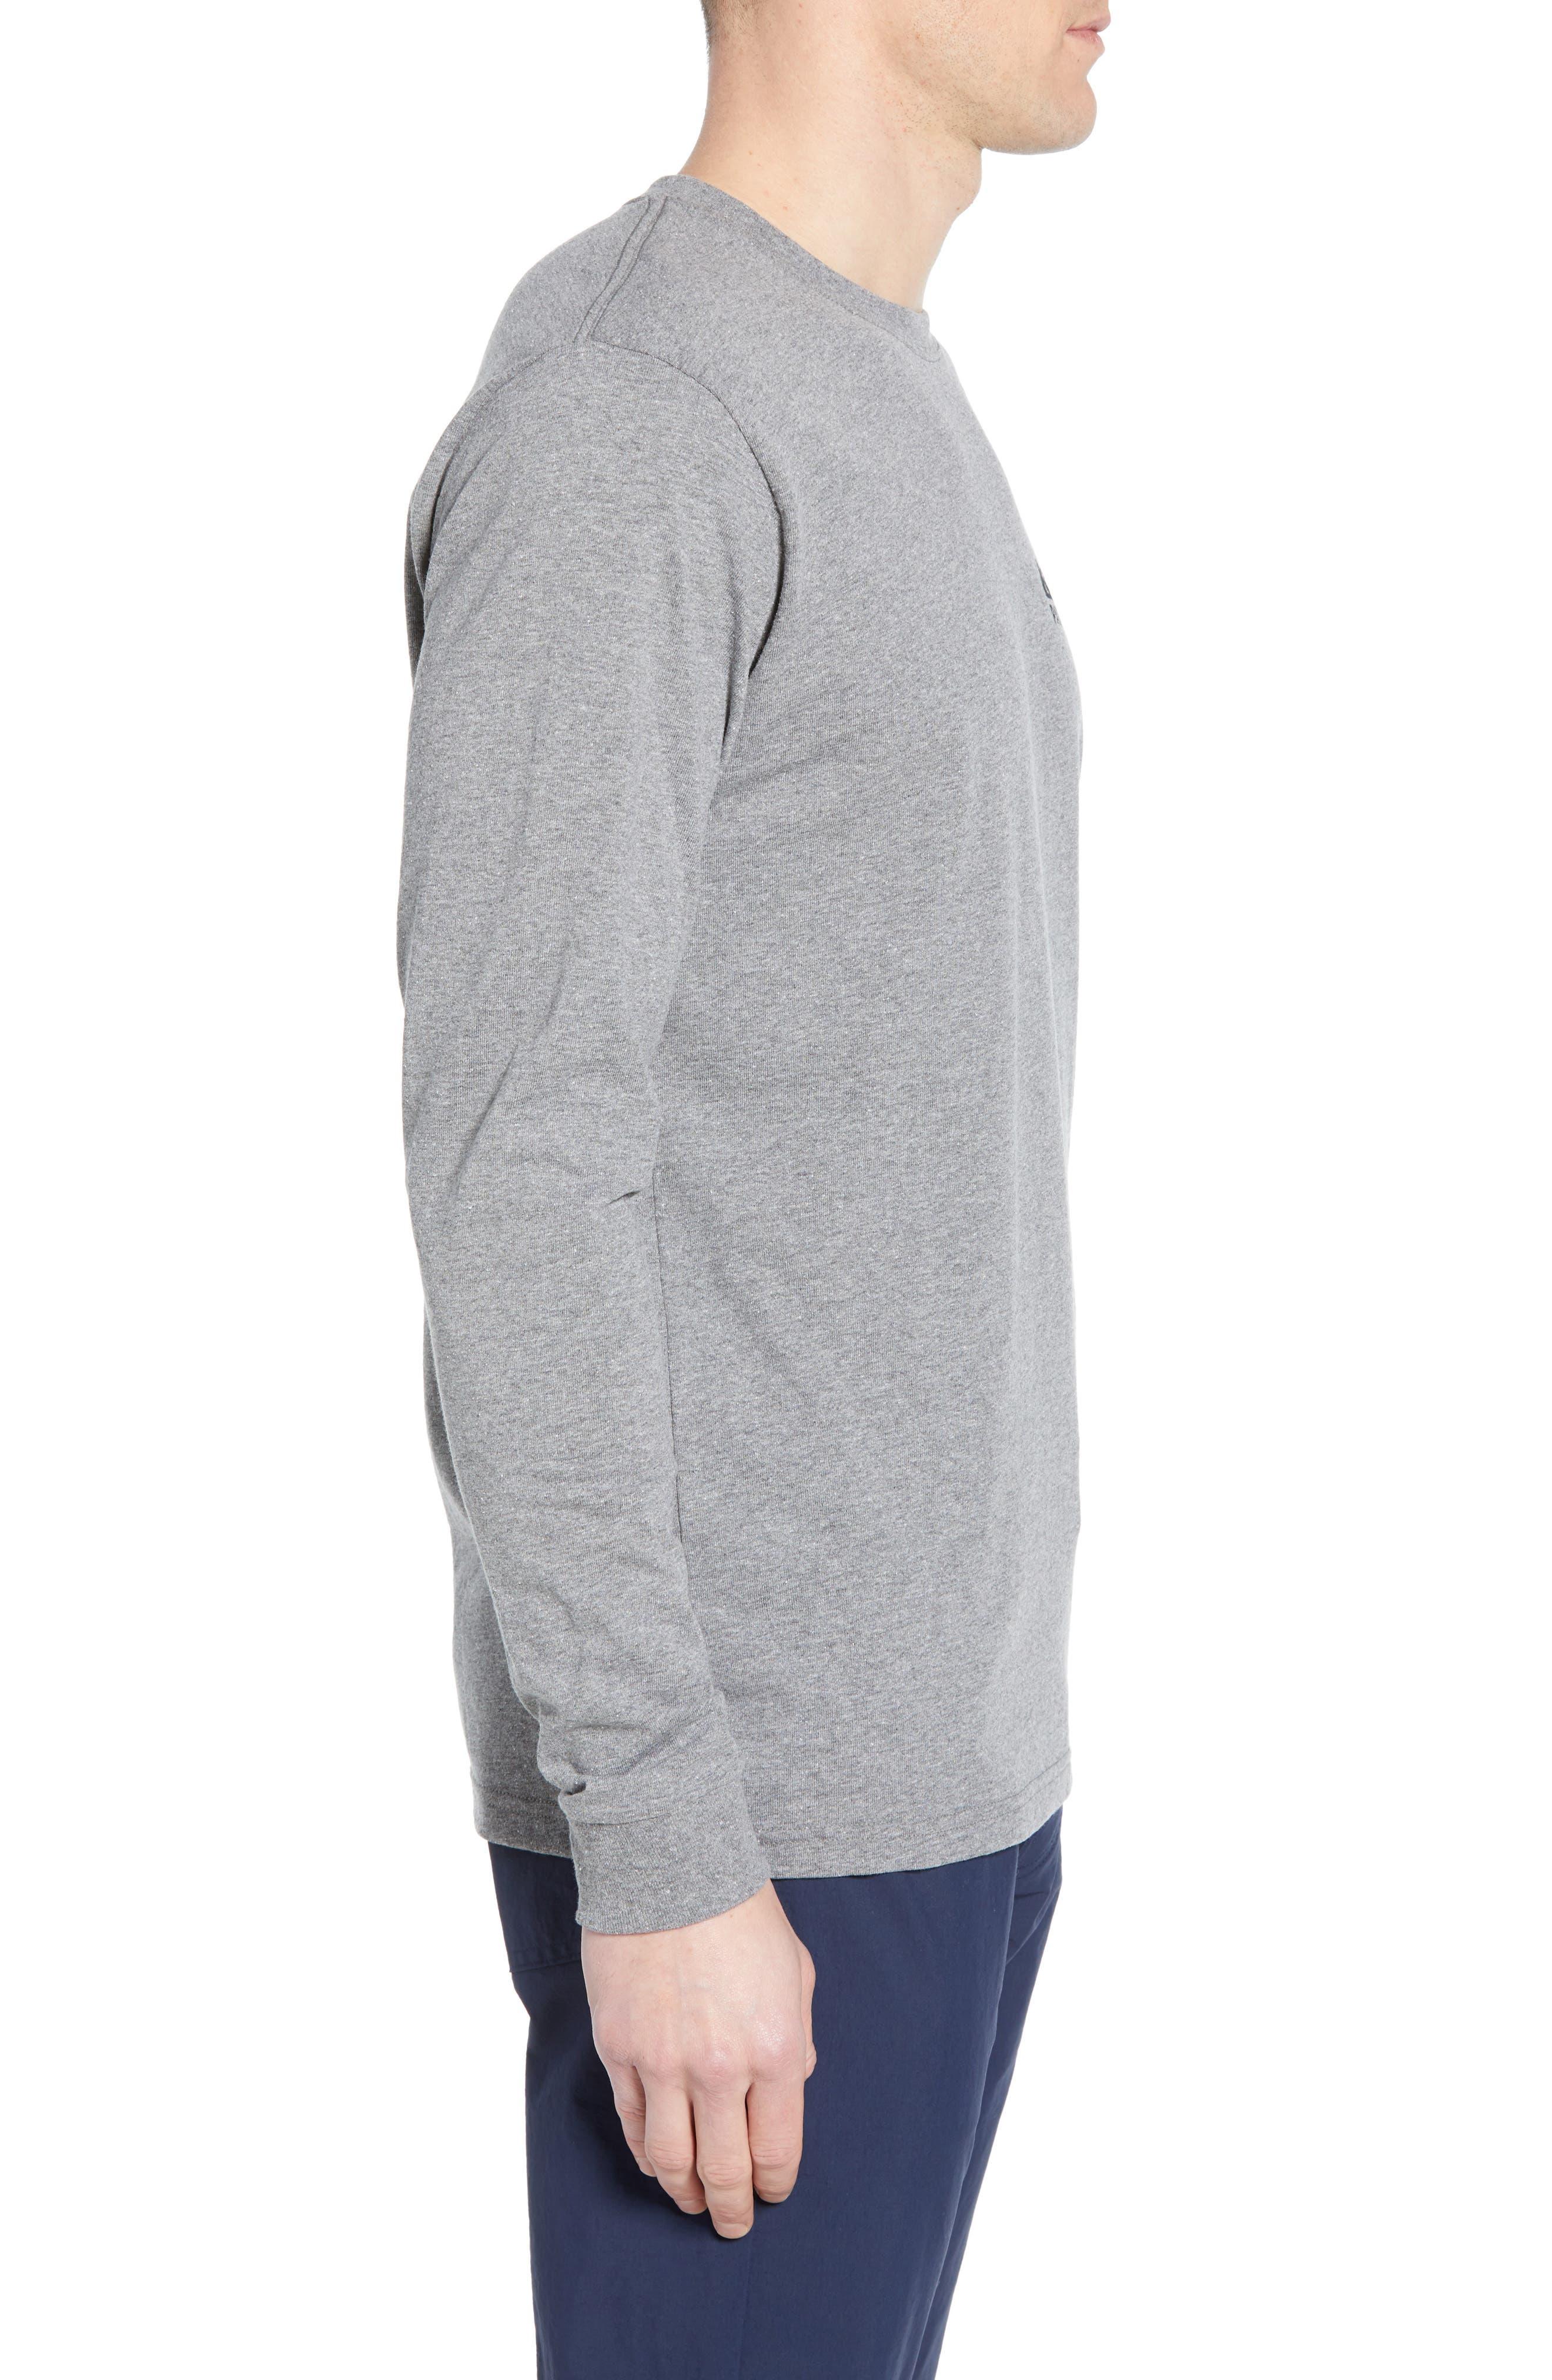 Fitz Roy Scope Long Sleeve Responsibili-Tee T-Shirt,                             Alternate thumbnail 3, color,                             GRAVEL HEATHER